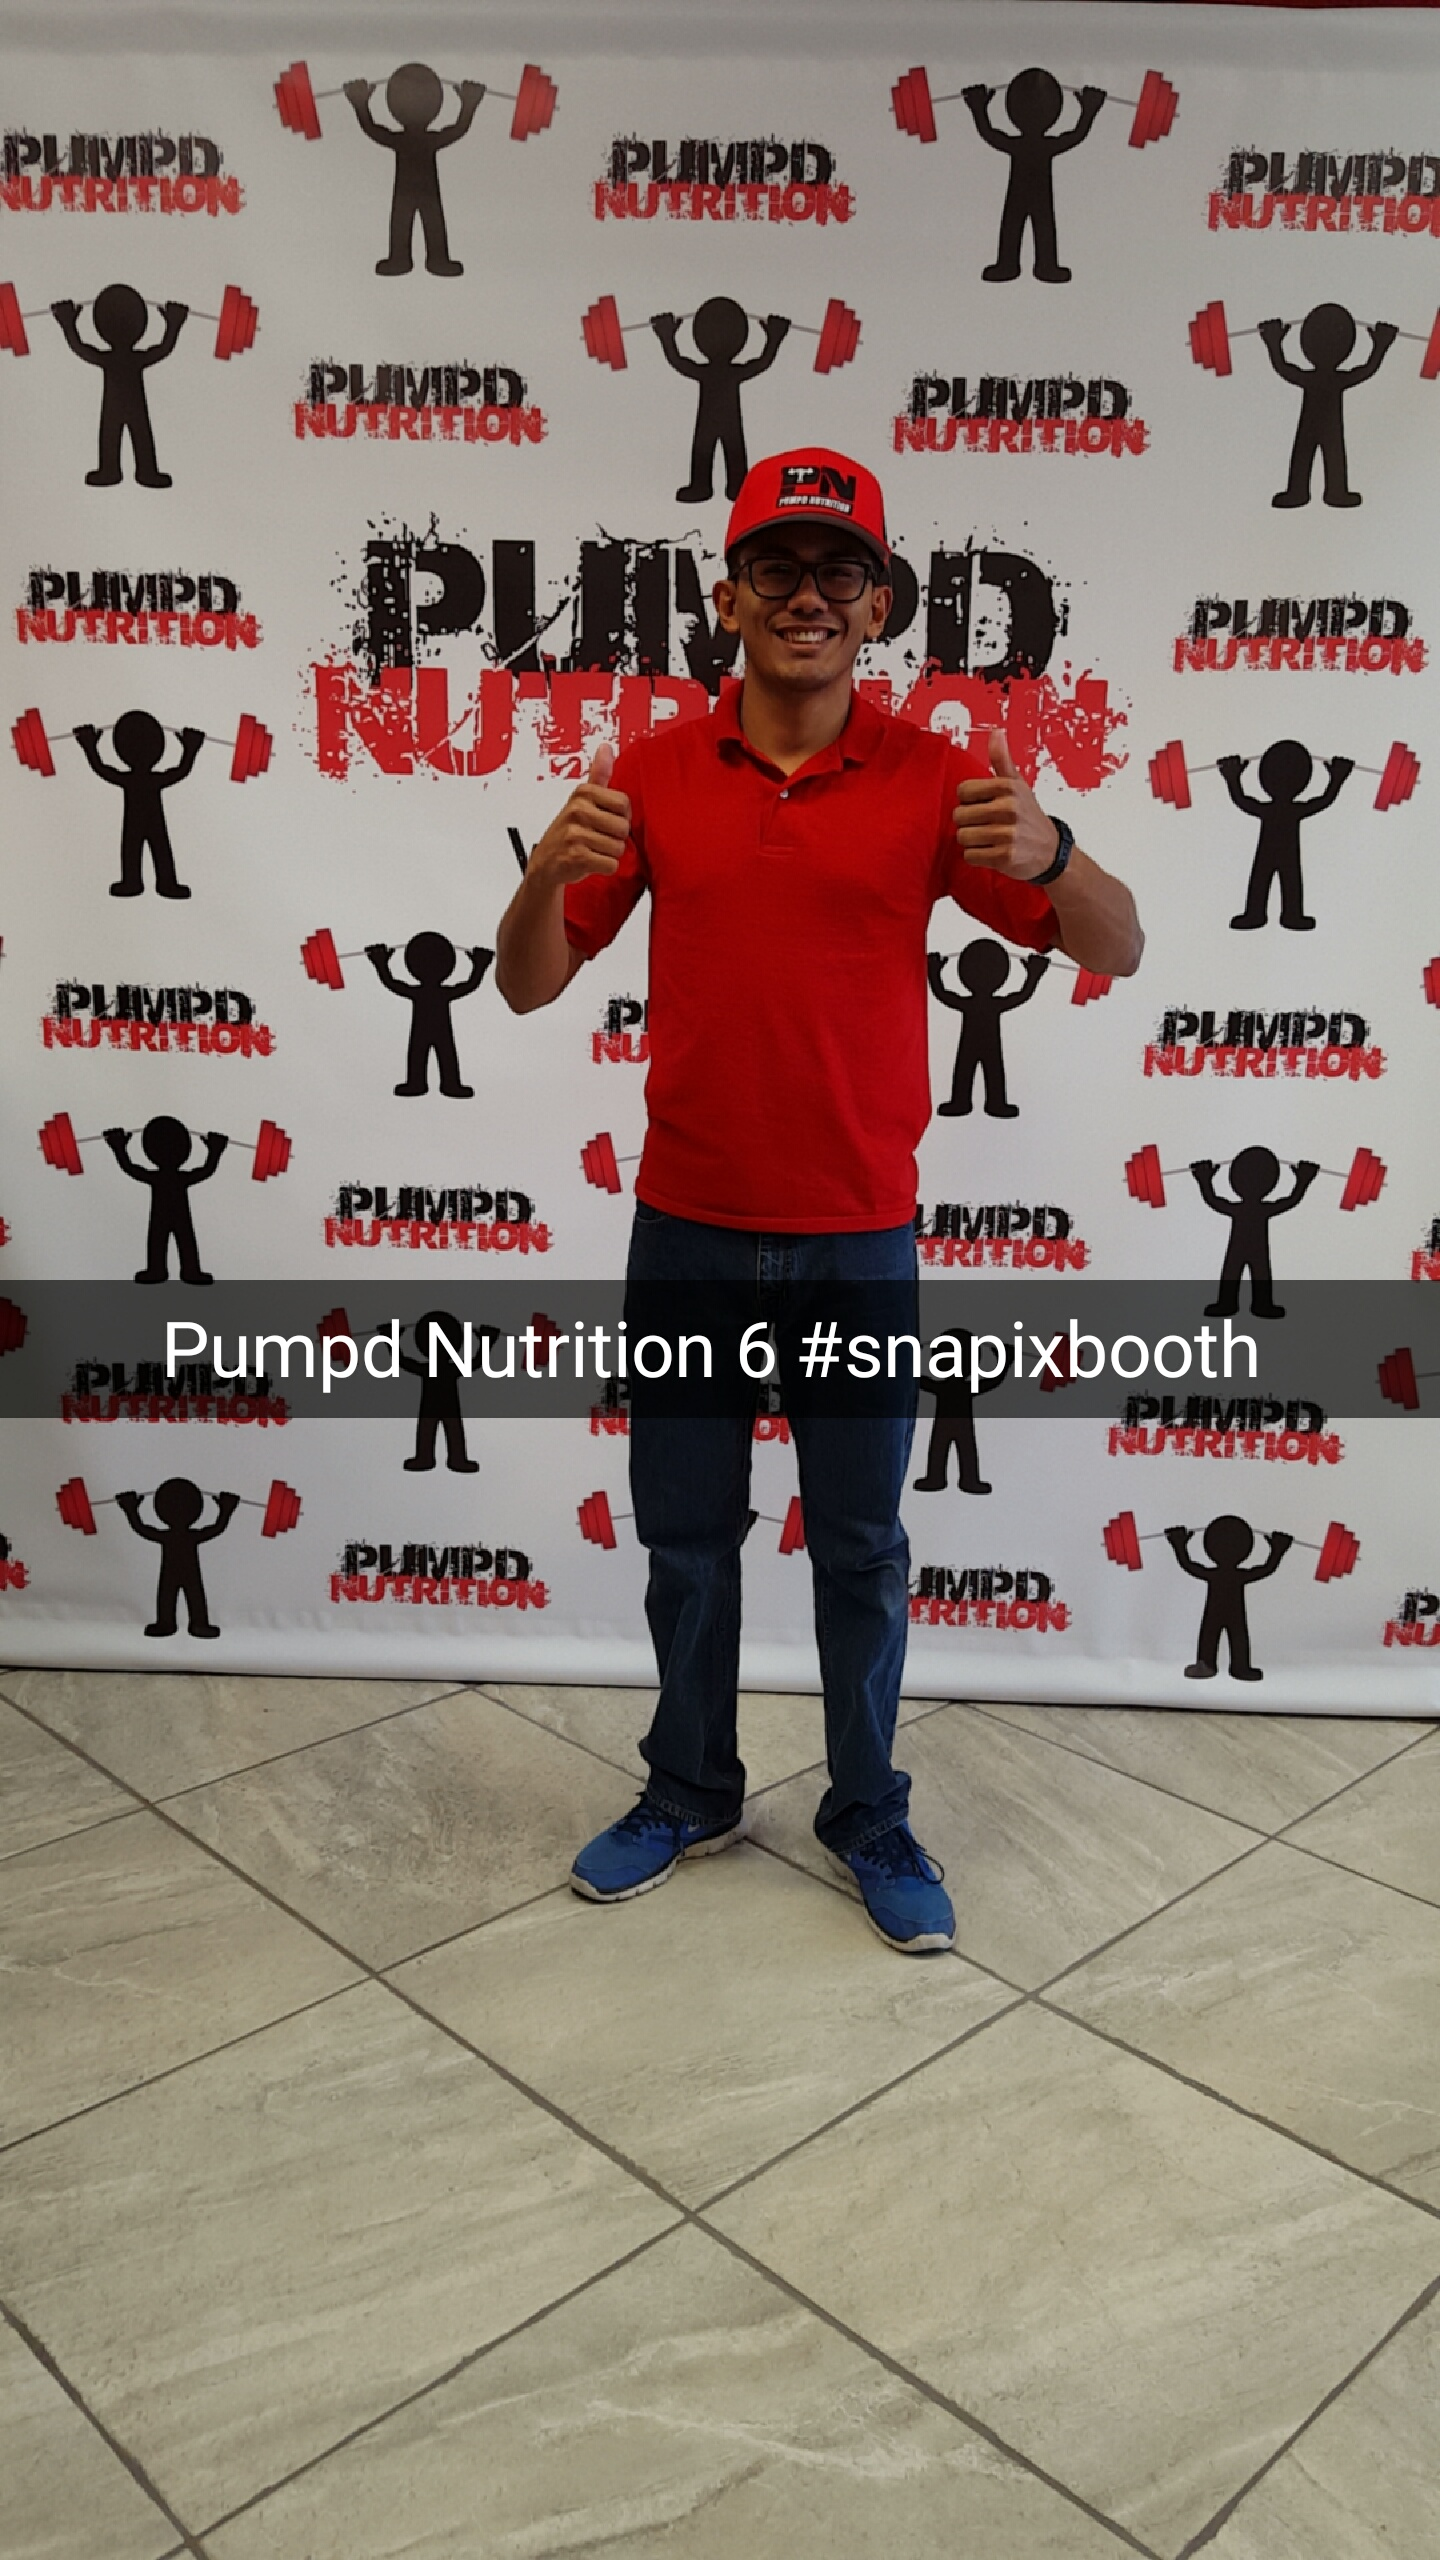 Pumpd Nutrition 6 Vinyl Banner